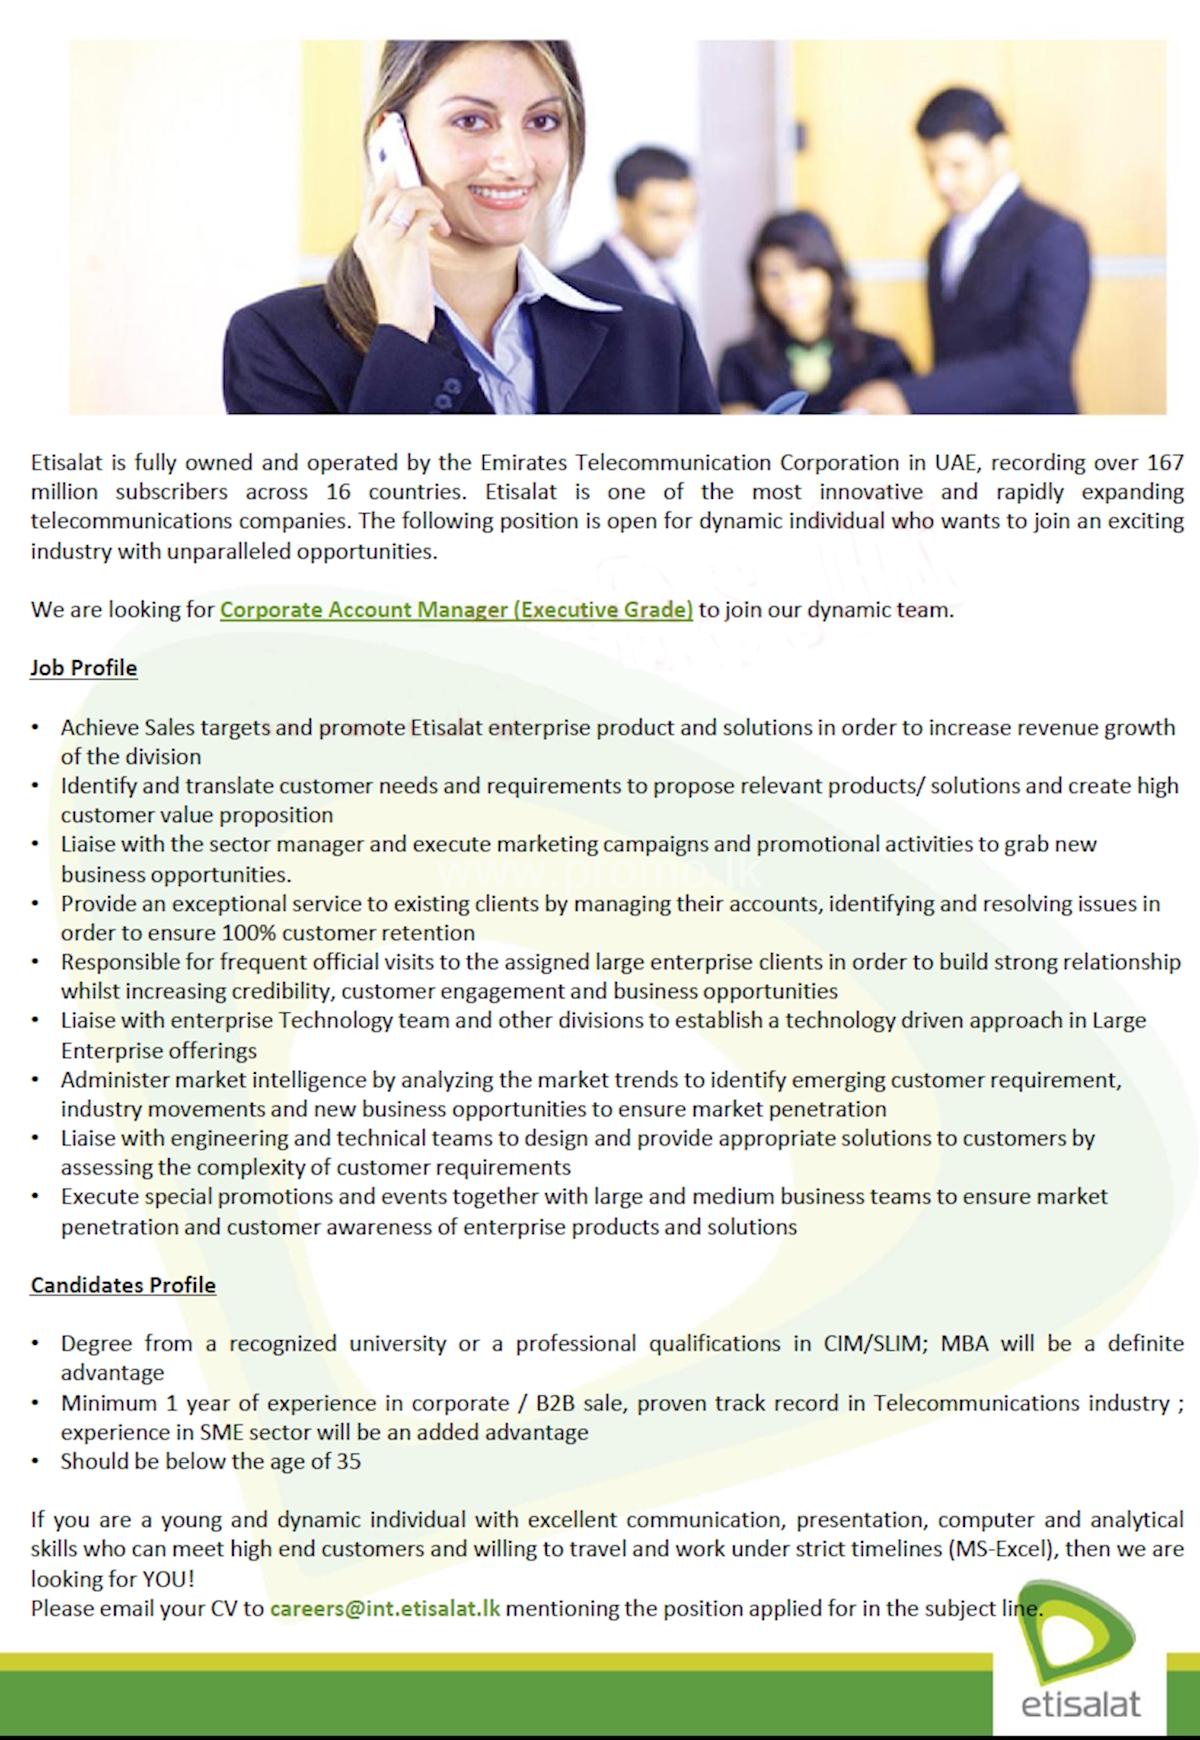 Corporate Account Manager (Executive Grade)